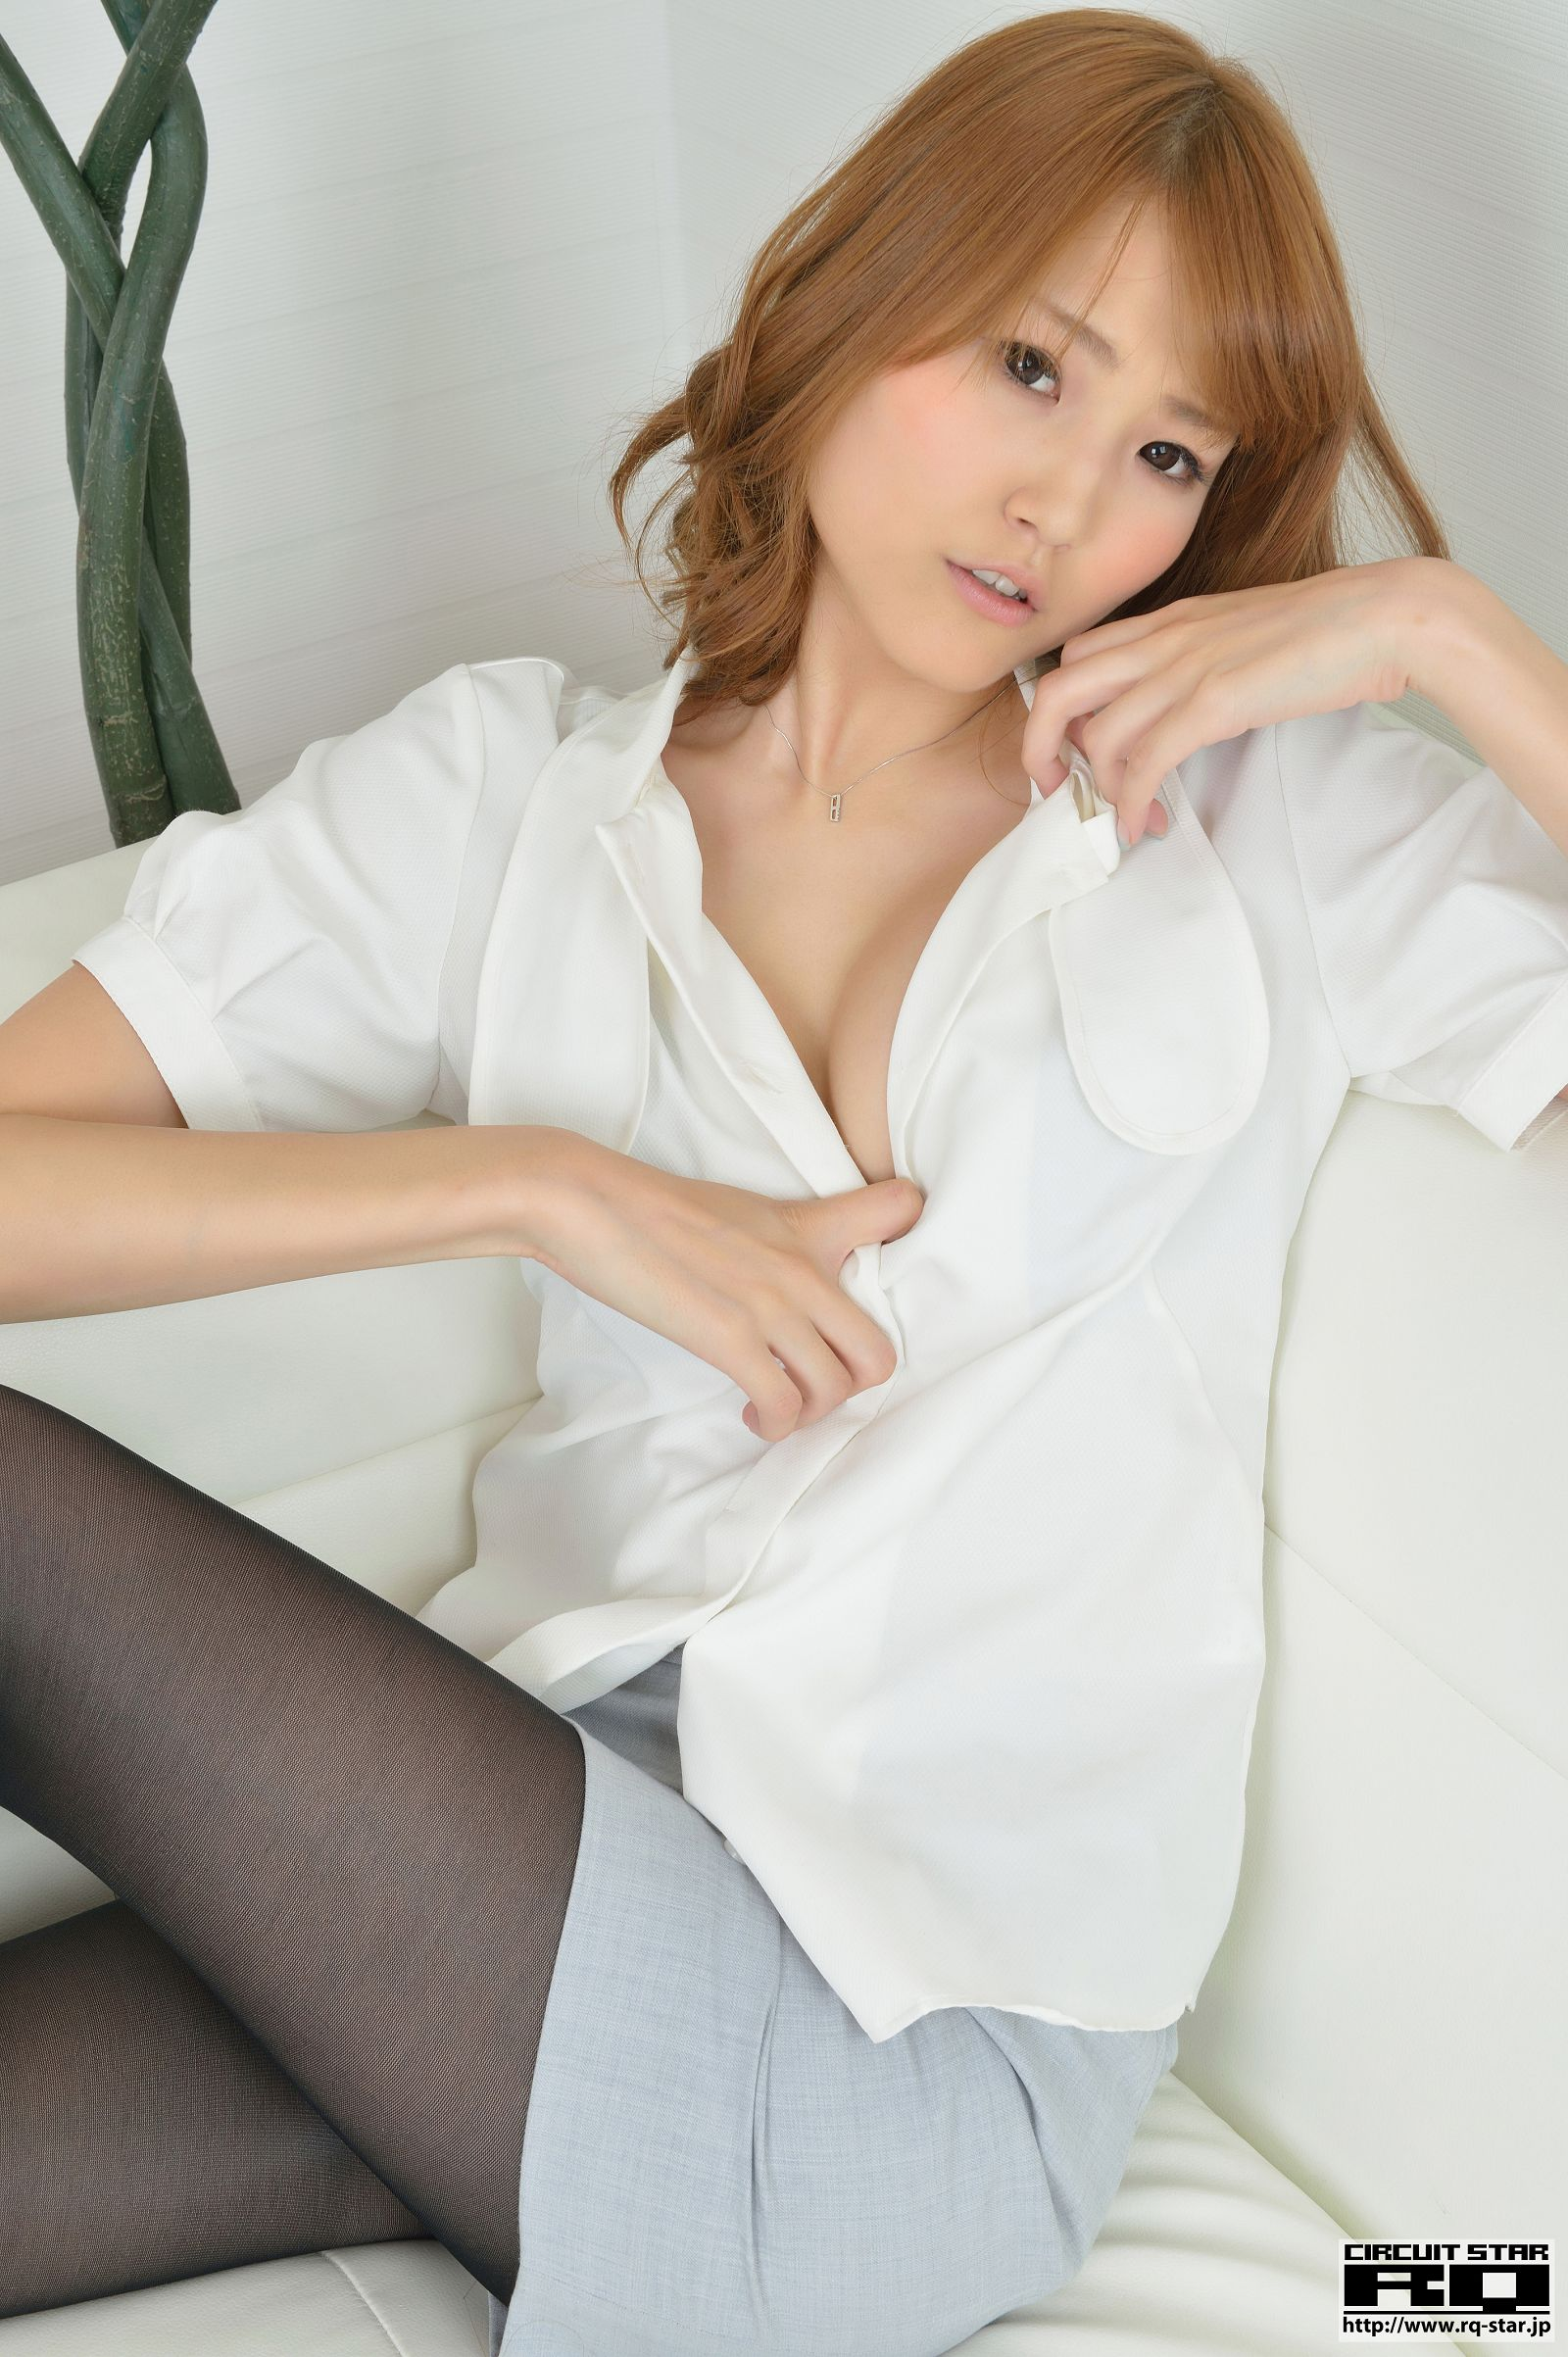 [RQ STAR美女] NO.01057 Aya Matsubayashi 松林彩 Office Lady[105P] RQ STAR 第3张